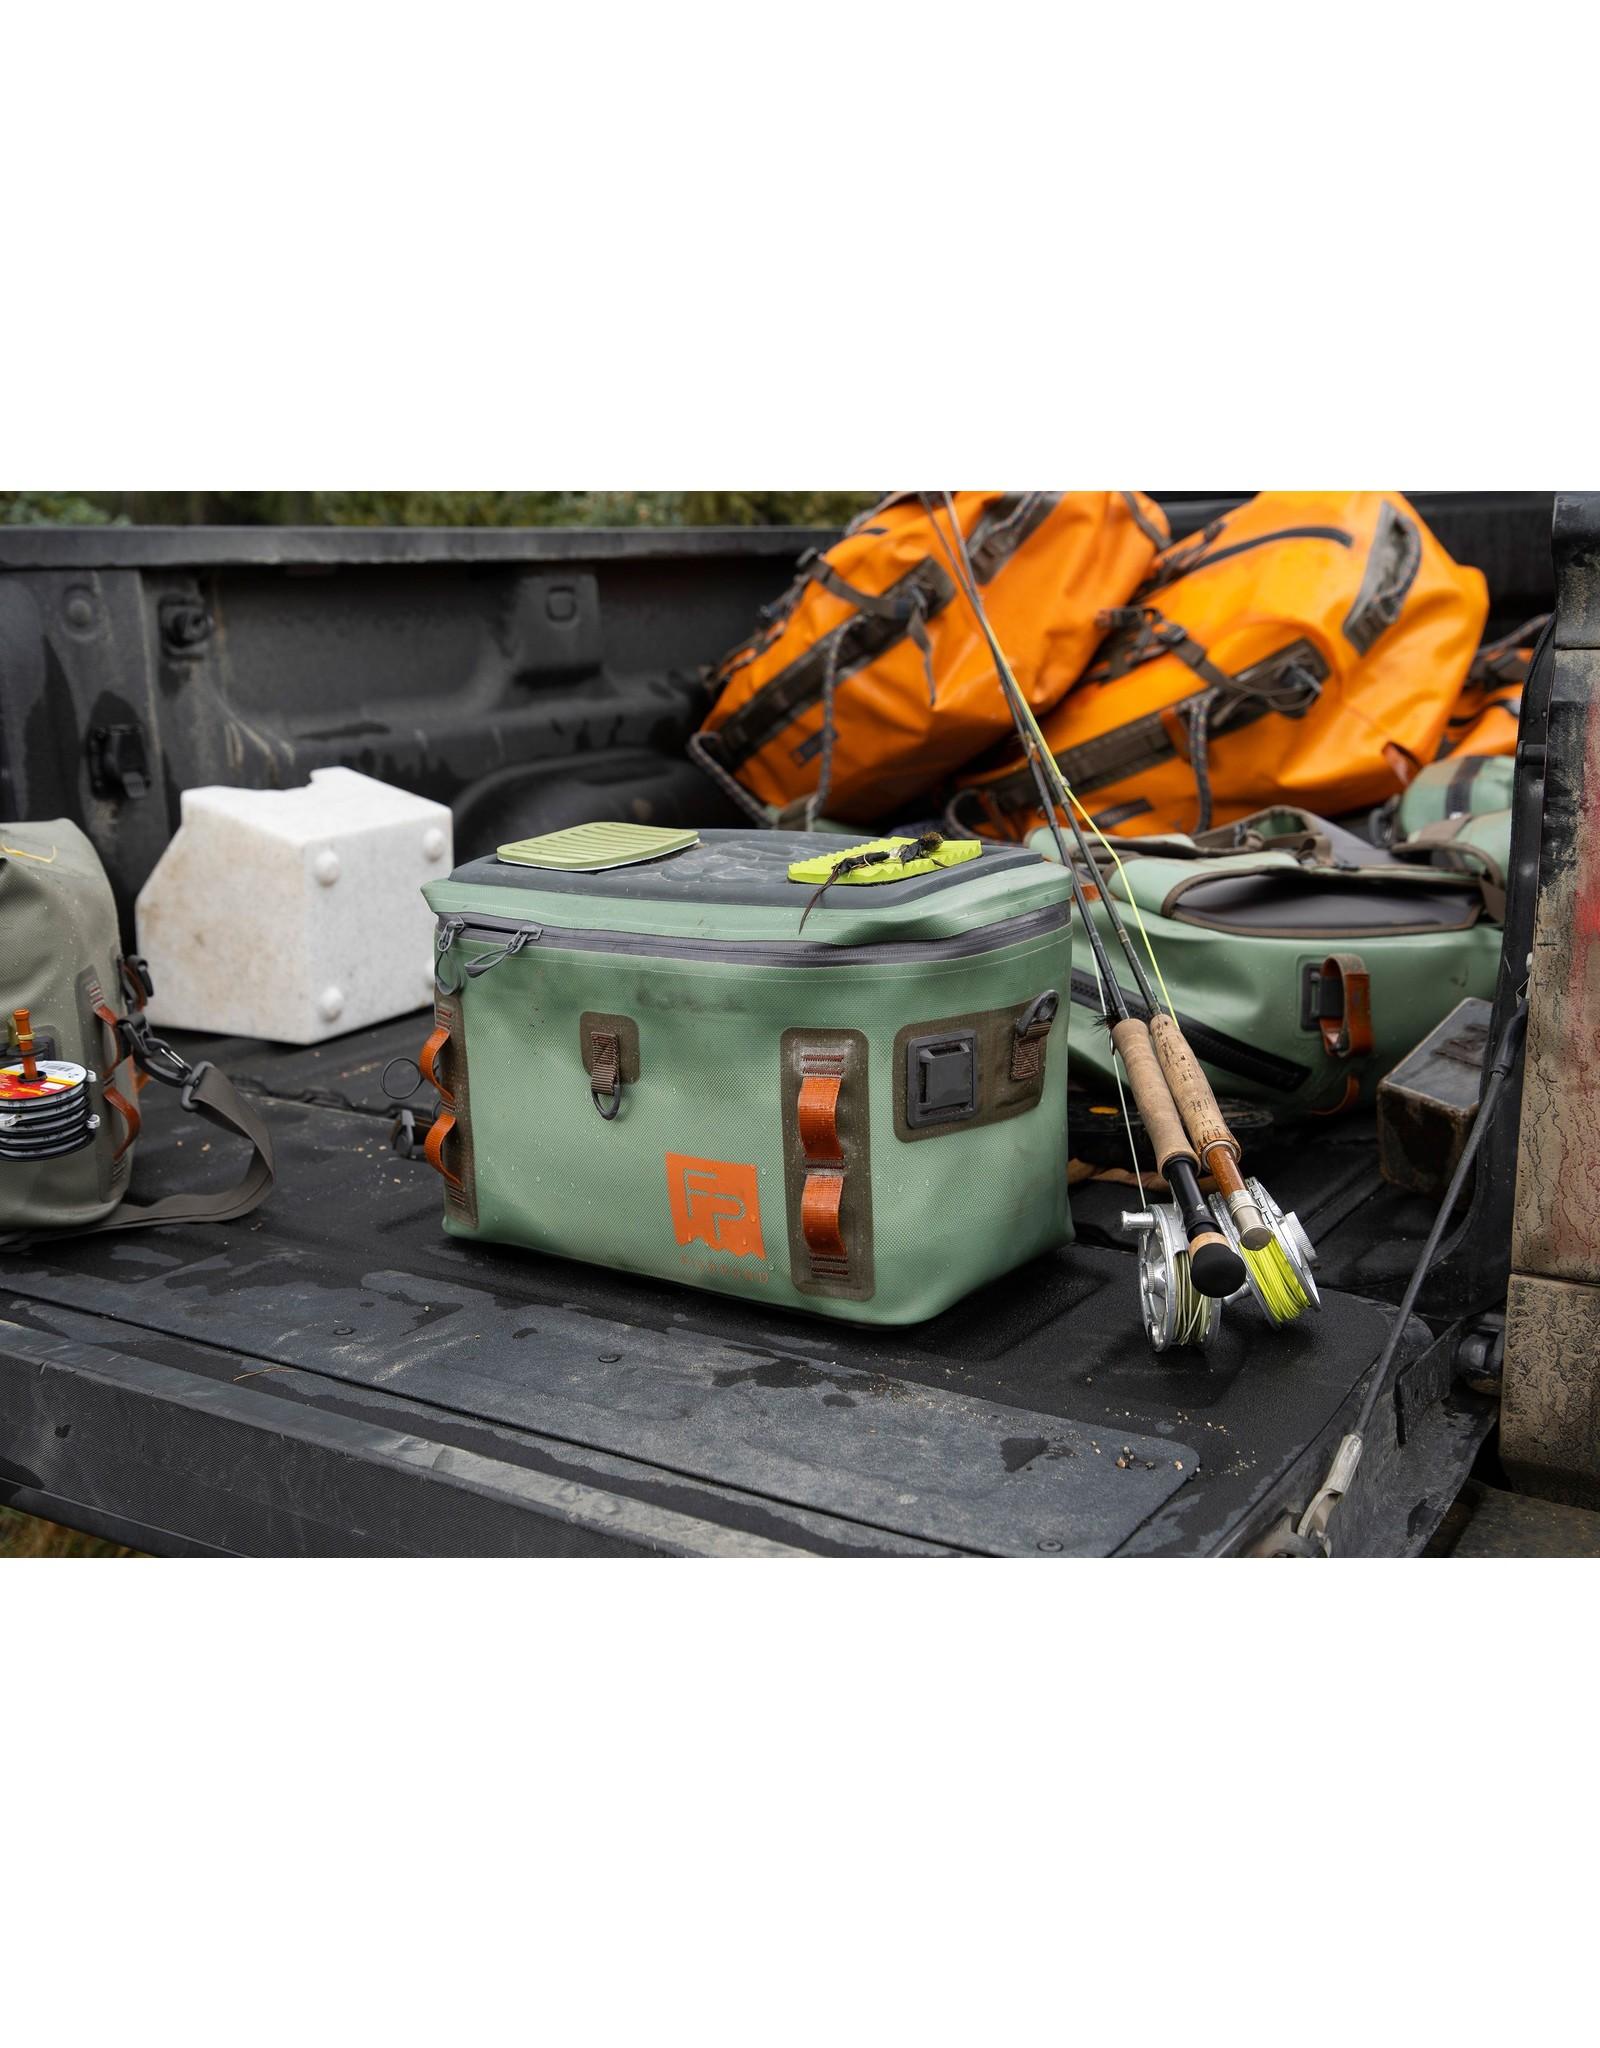 Fishpond Fishpond - Cutbank Gear Bag